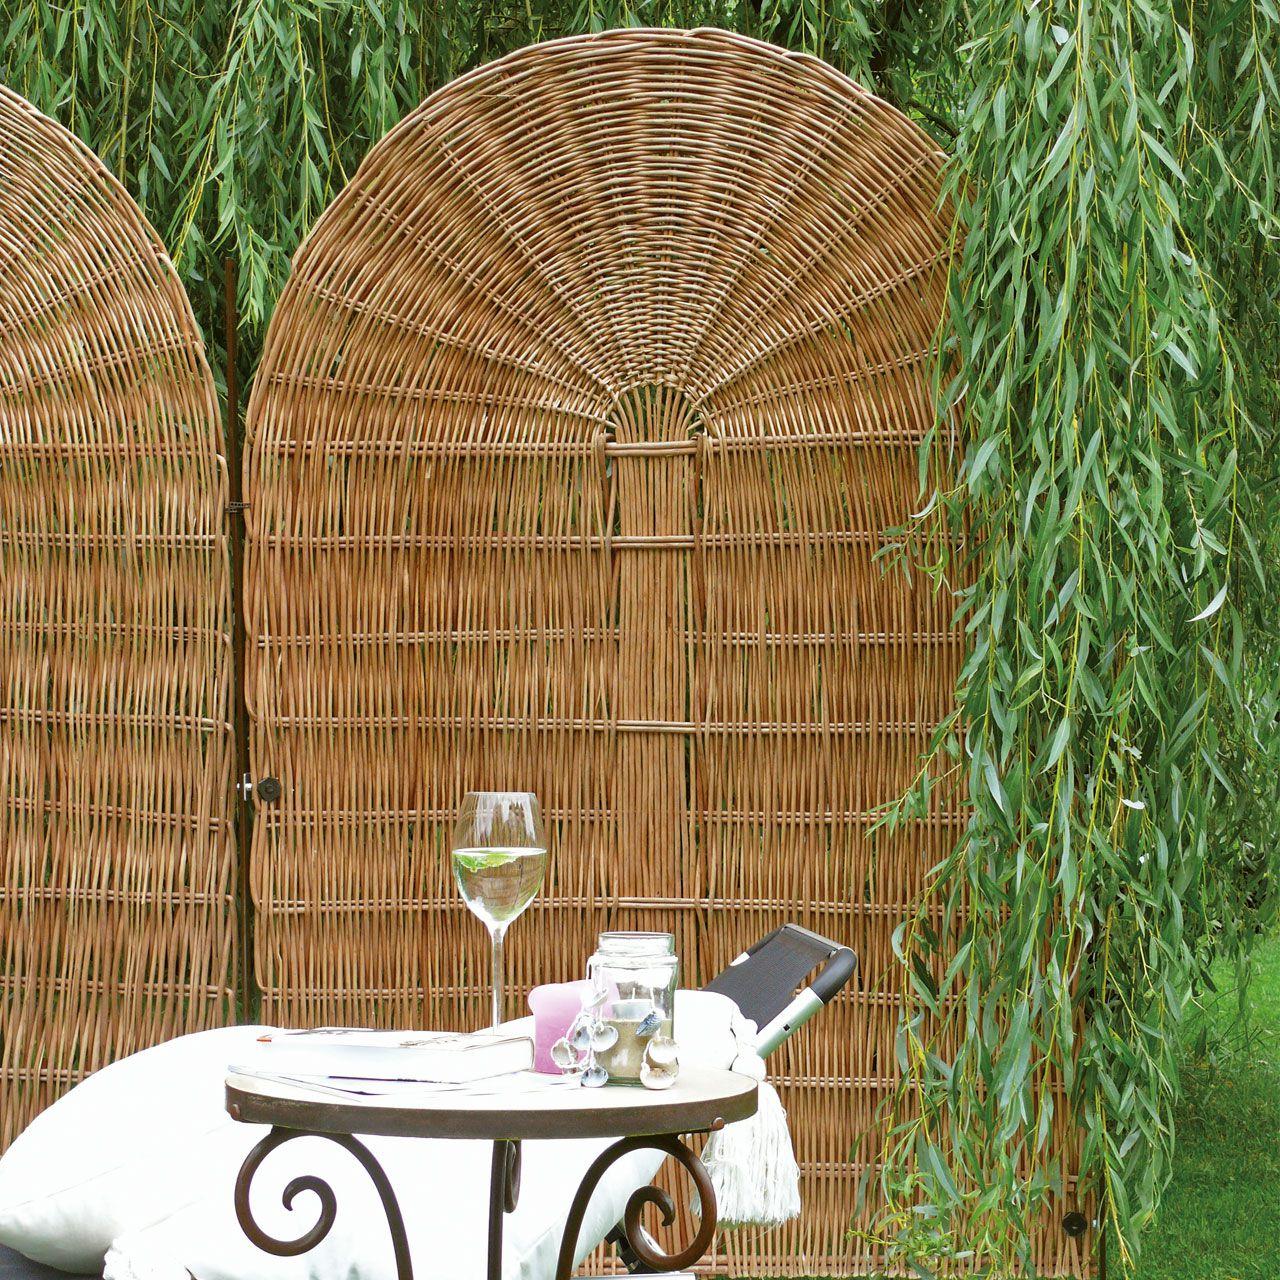 grundkurs gartenplanung: sitzplätze im garten – [living at home, Wohnzimmer dekoo